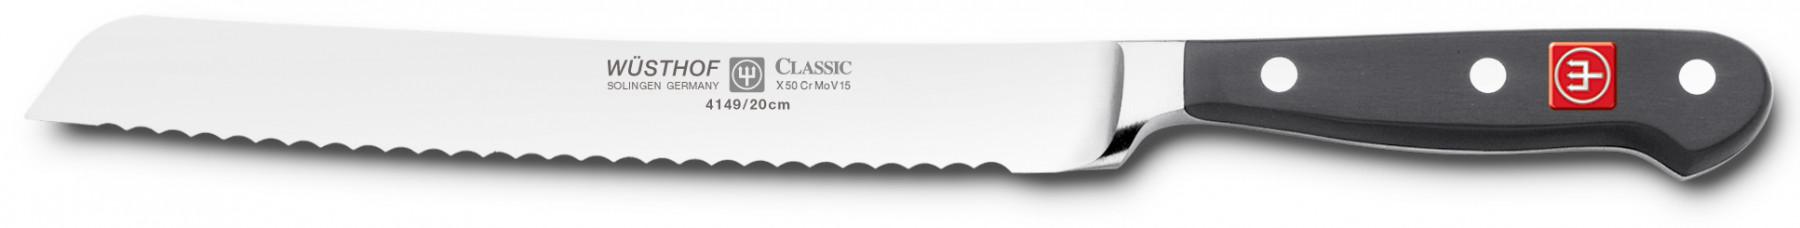 Wüsthof Dreizack Classic Messerblock 8tlg. schwarz Brotmesser